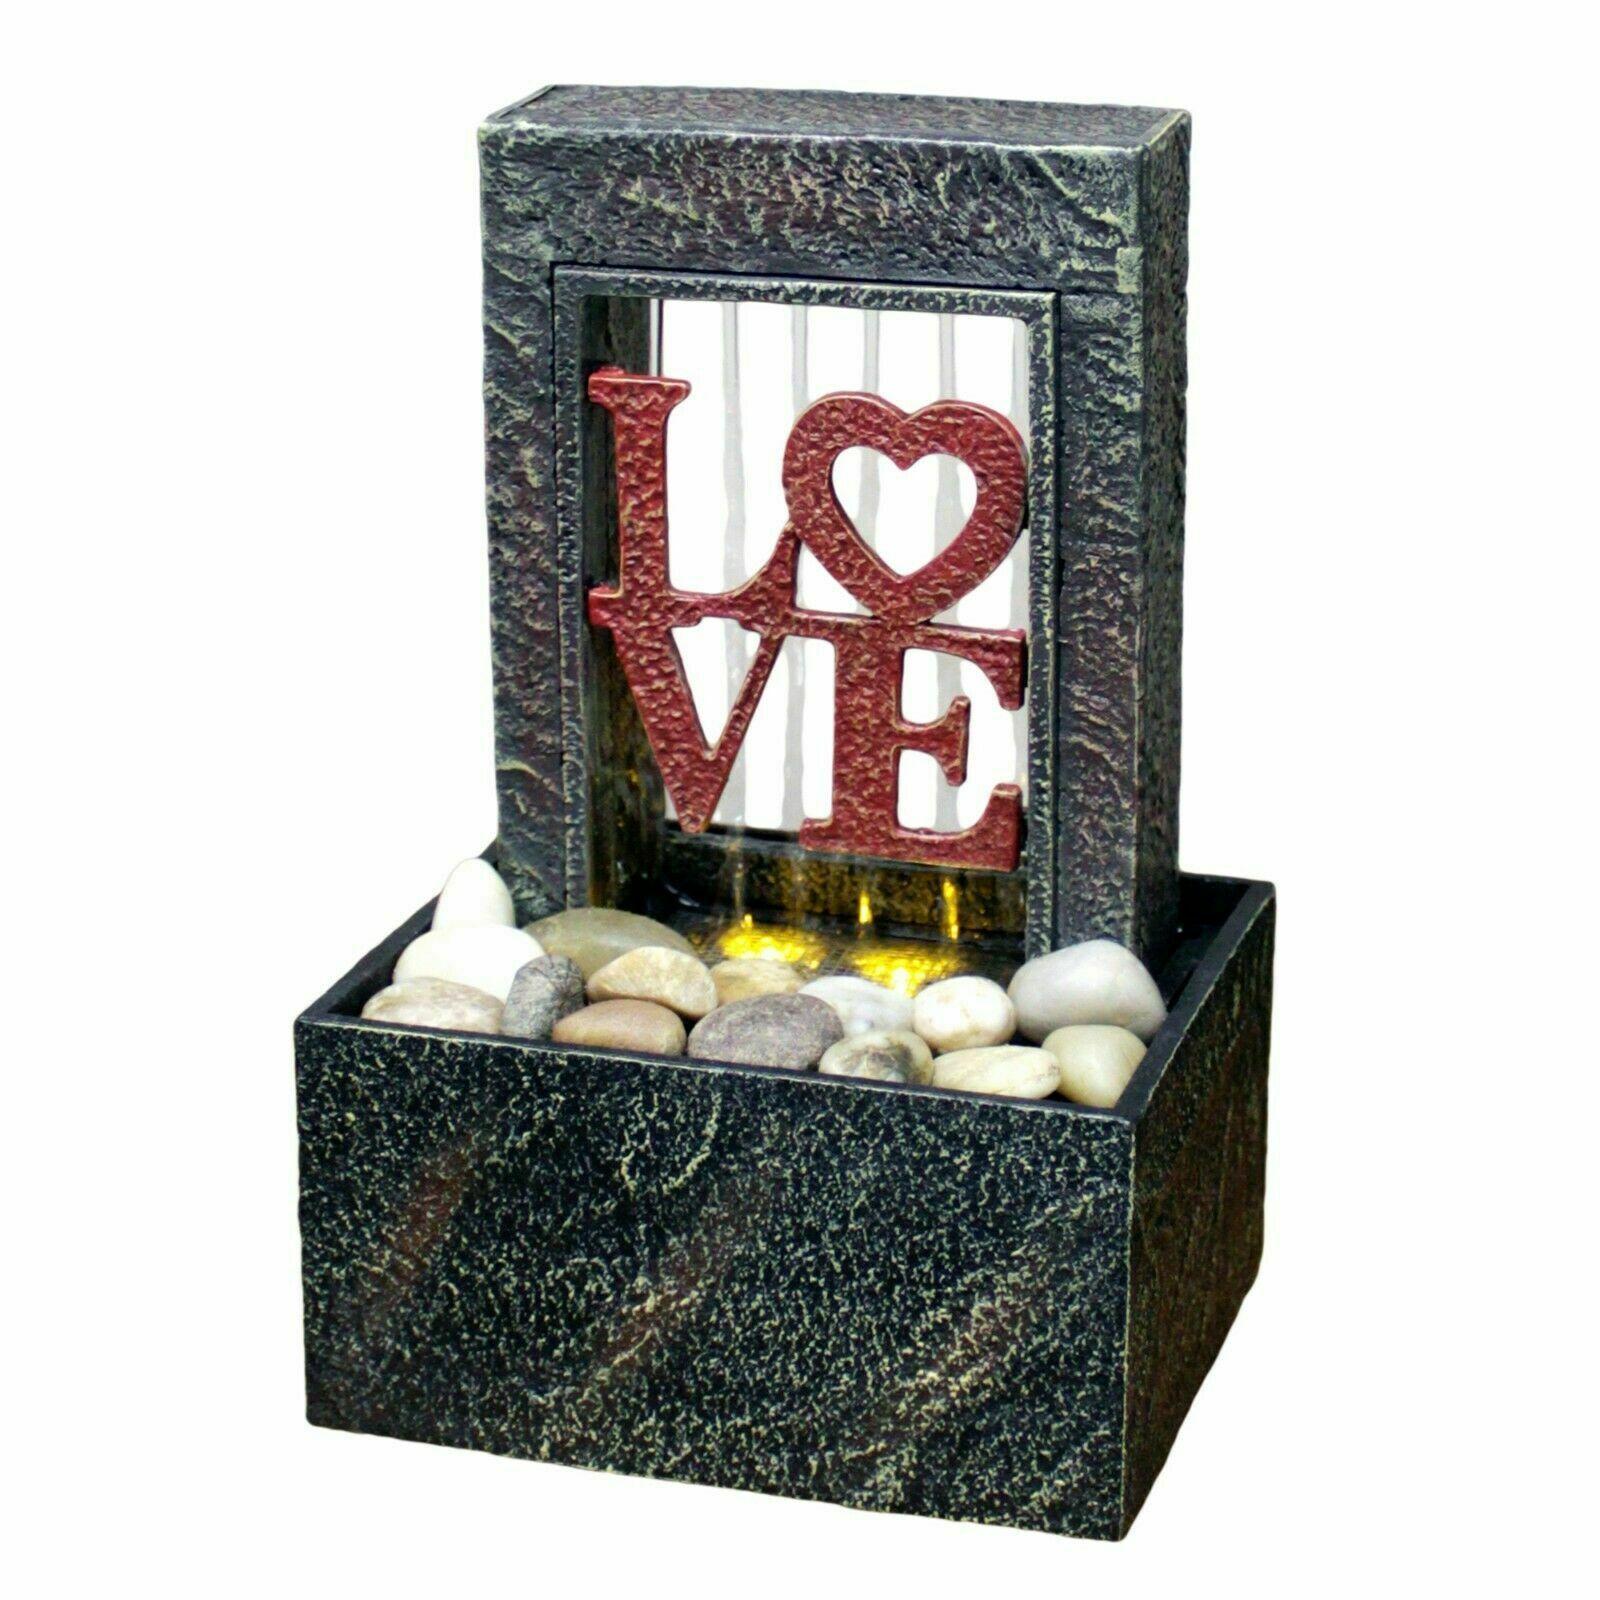 Soothing Relaxing Raining Heart Love LED Fountain Desk Indoor Water Fountain ZEN - $39.59